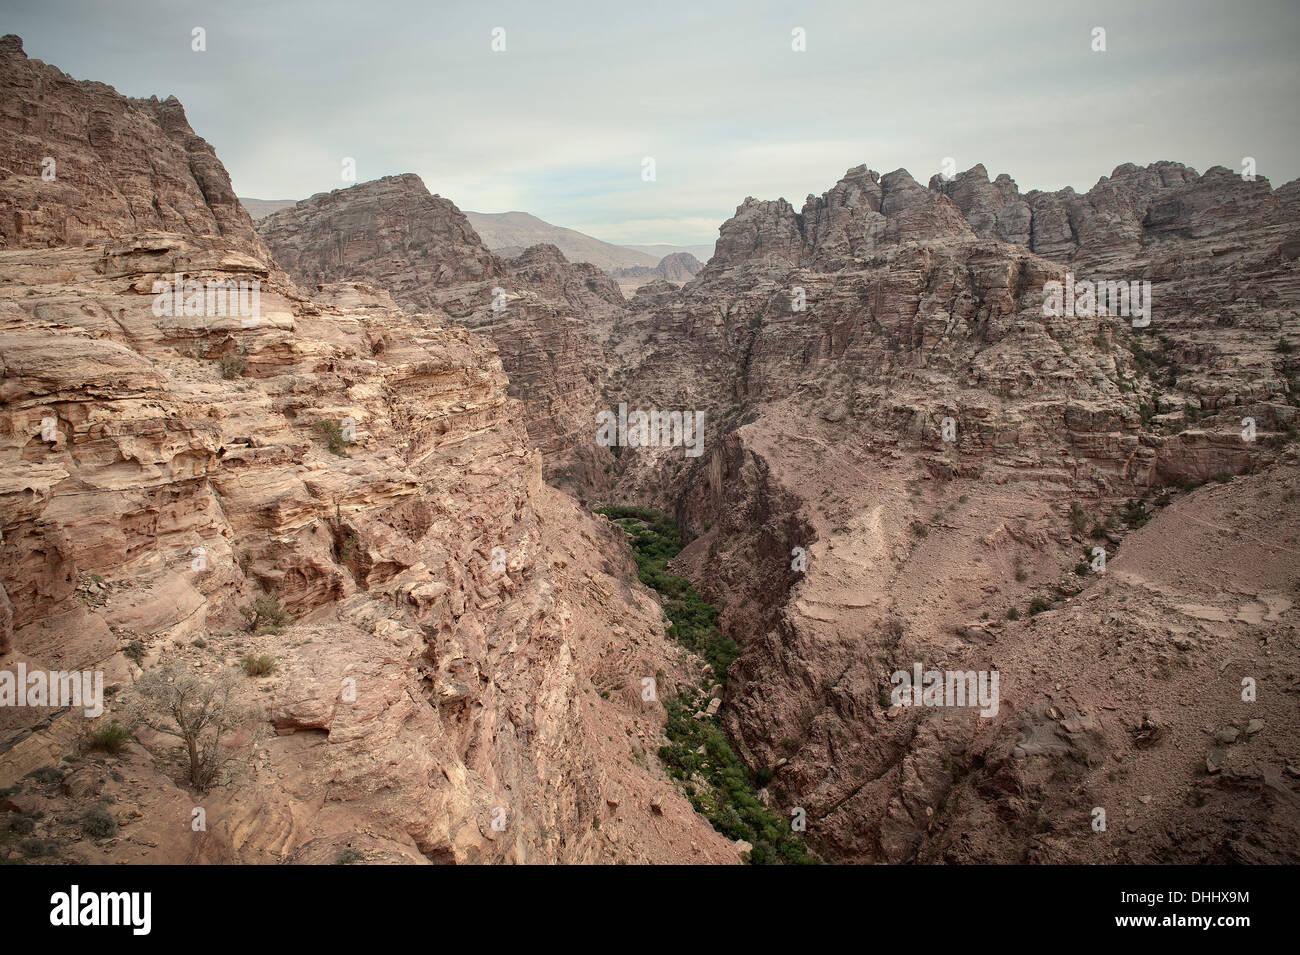 Mountain landscape at Petra, UNESCO world herritage, Wadi Musa, Jordan, Middle East, Asia - Stock Image